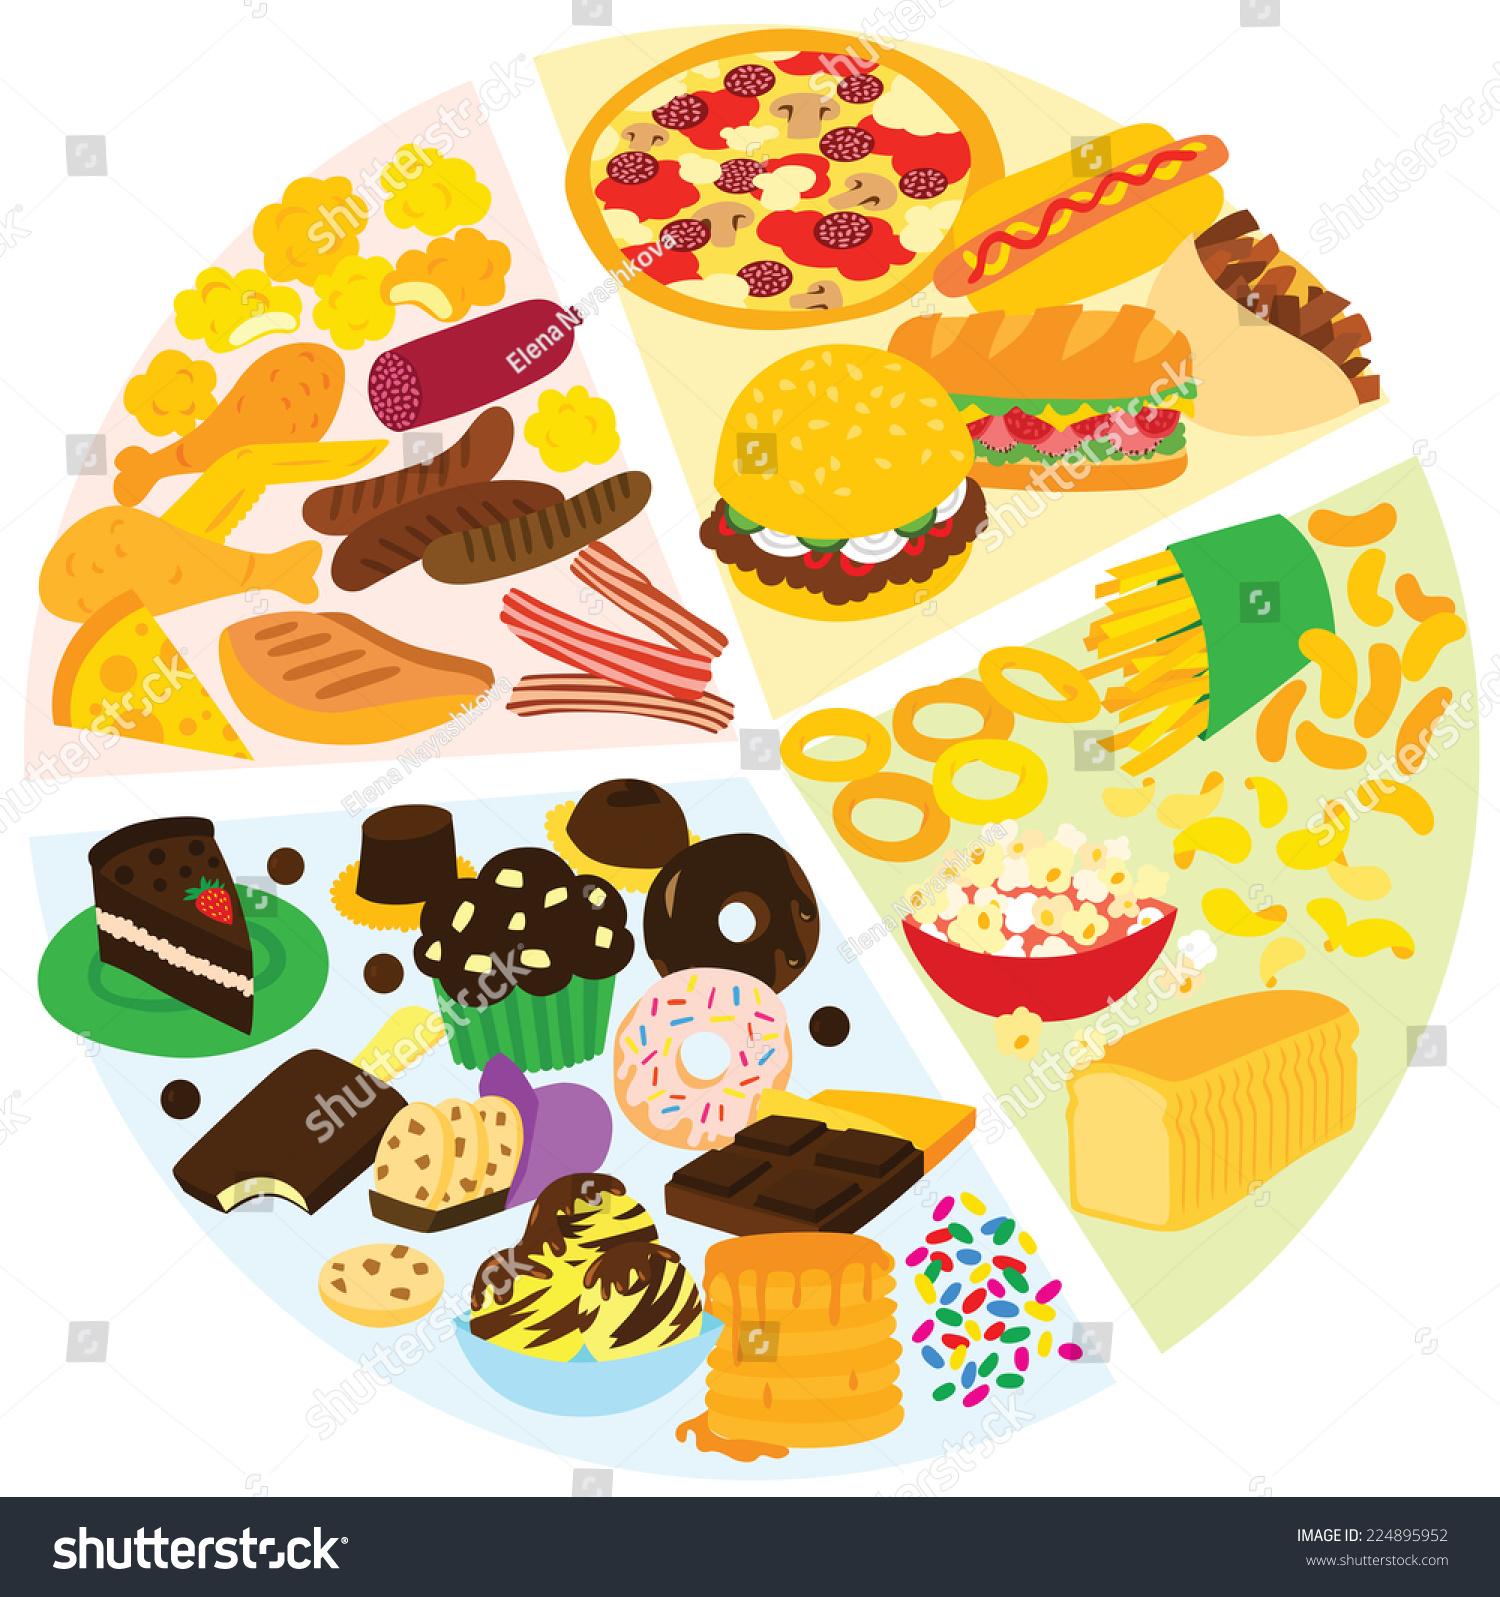 Unhealthy Food Plate Unhealthy Eating Pie C...